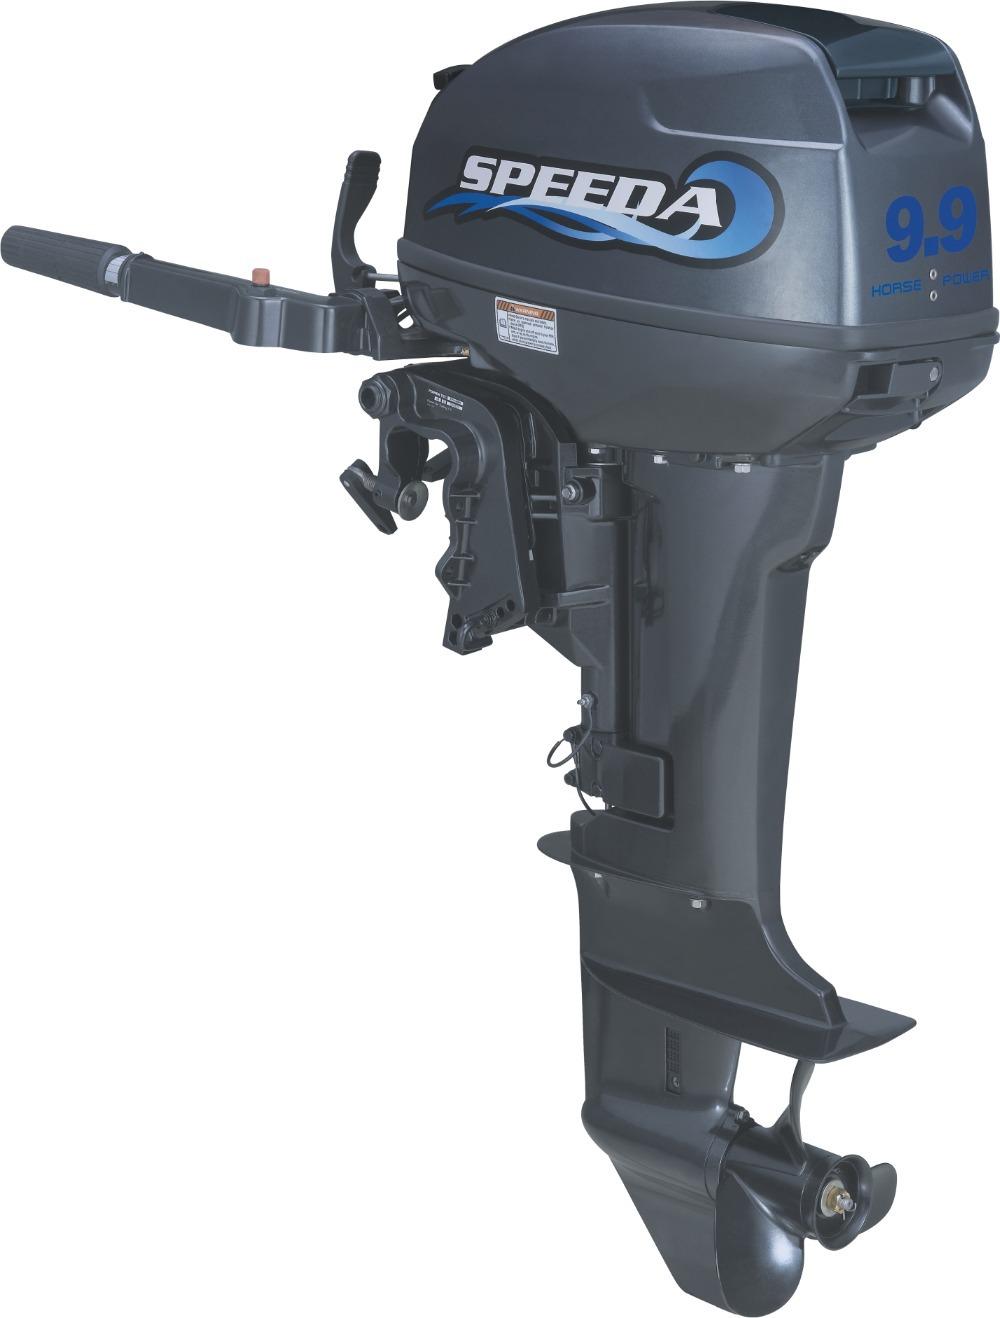 best sale quality water cooled 2 stroke 9 9hp 2 cylinder marine engine outboard motor for boats. Black Bedroom Furniture Sets. Home Design Ideas